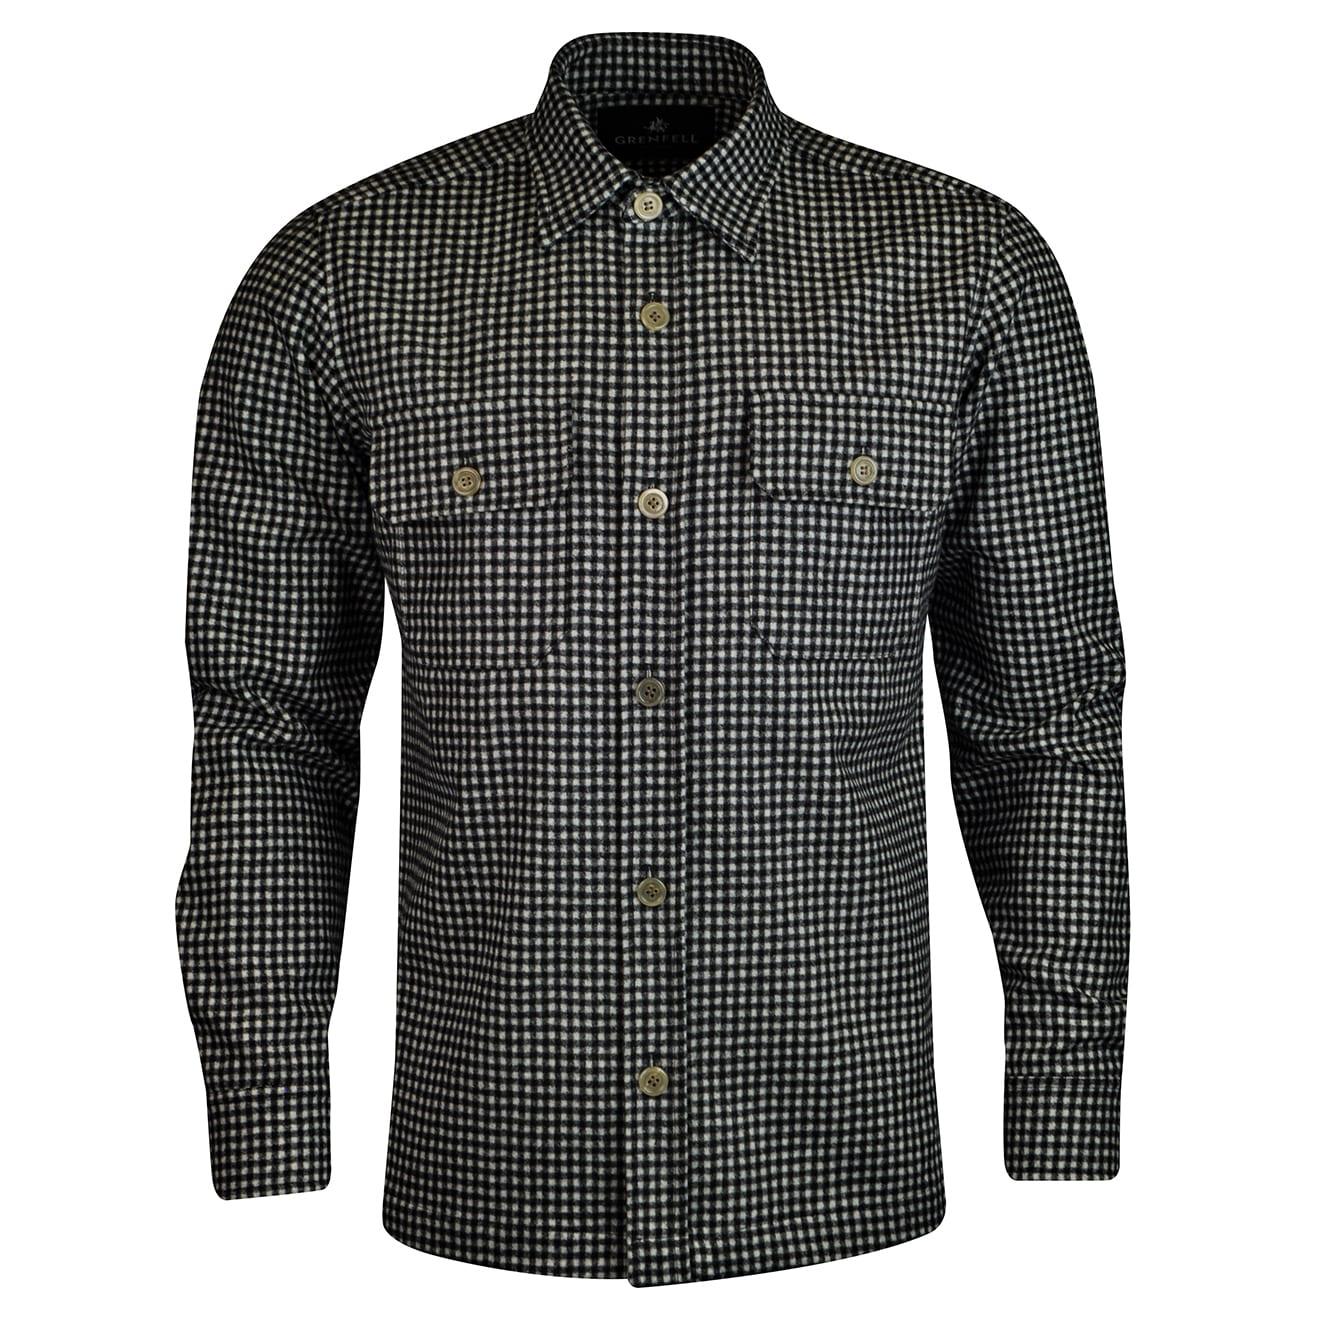 Grenfell gingham check wool overshirt white black